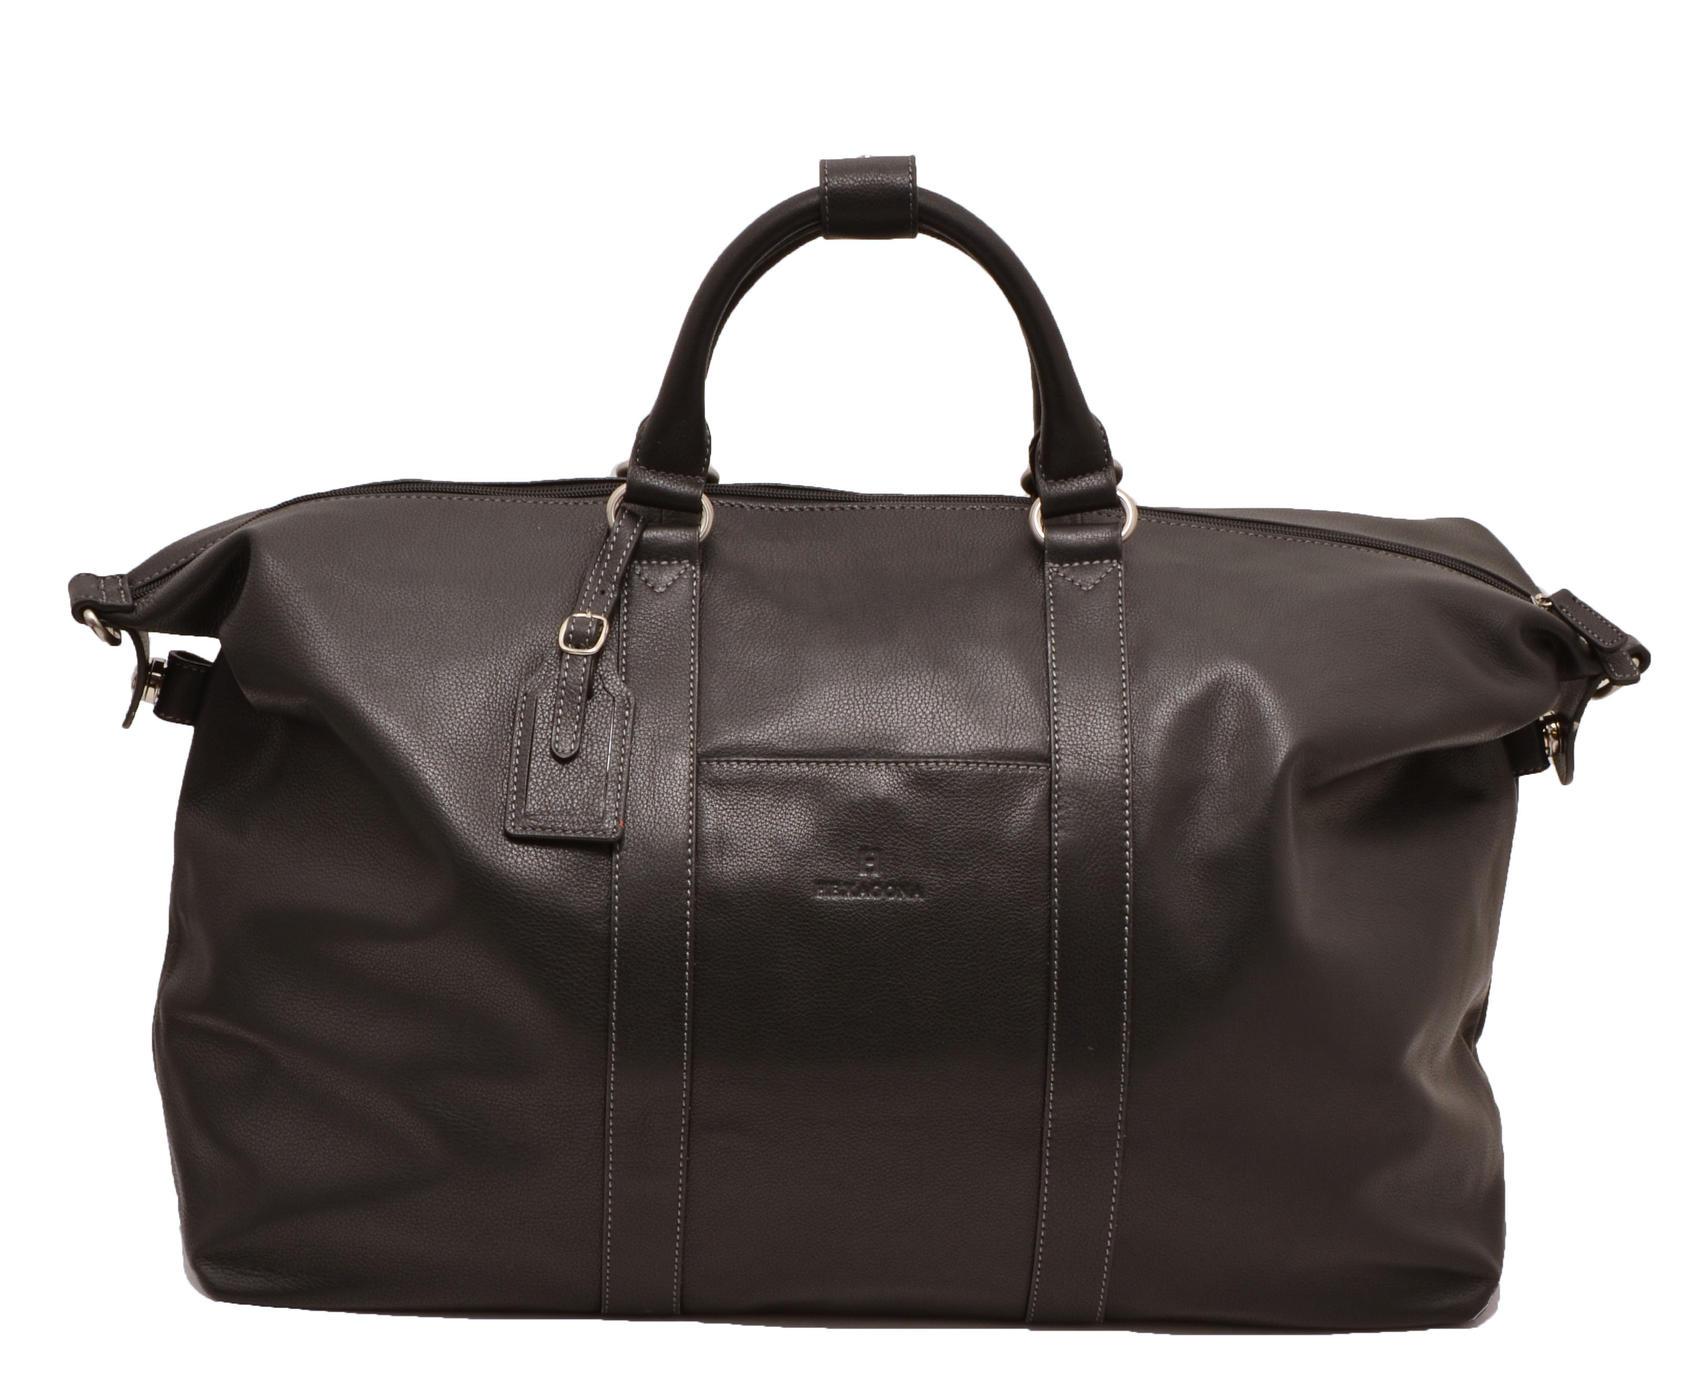 sac de voyage cuir femme